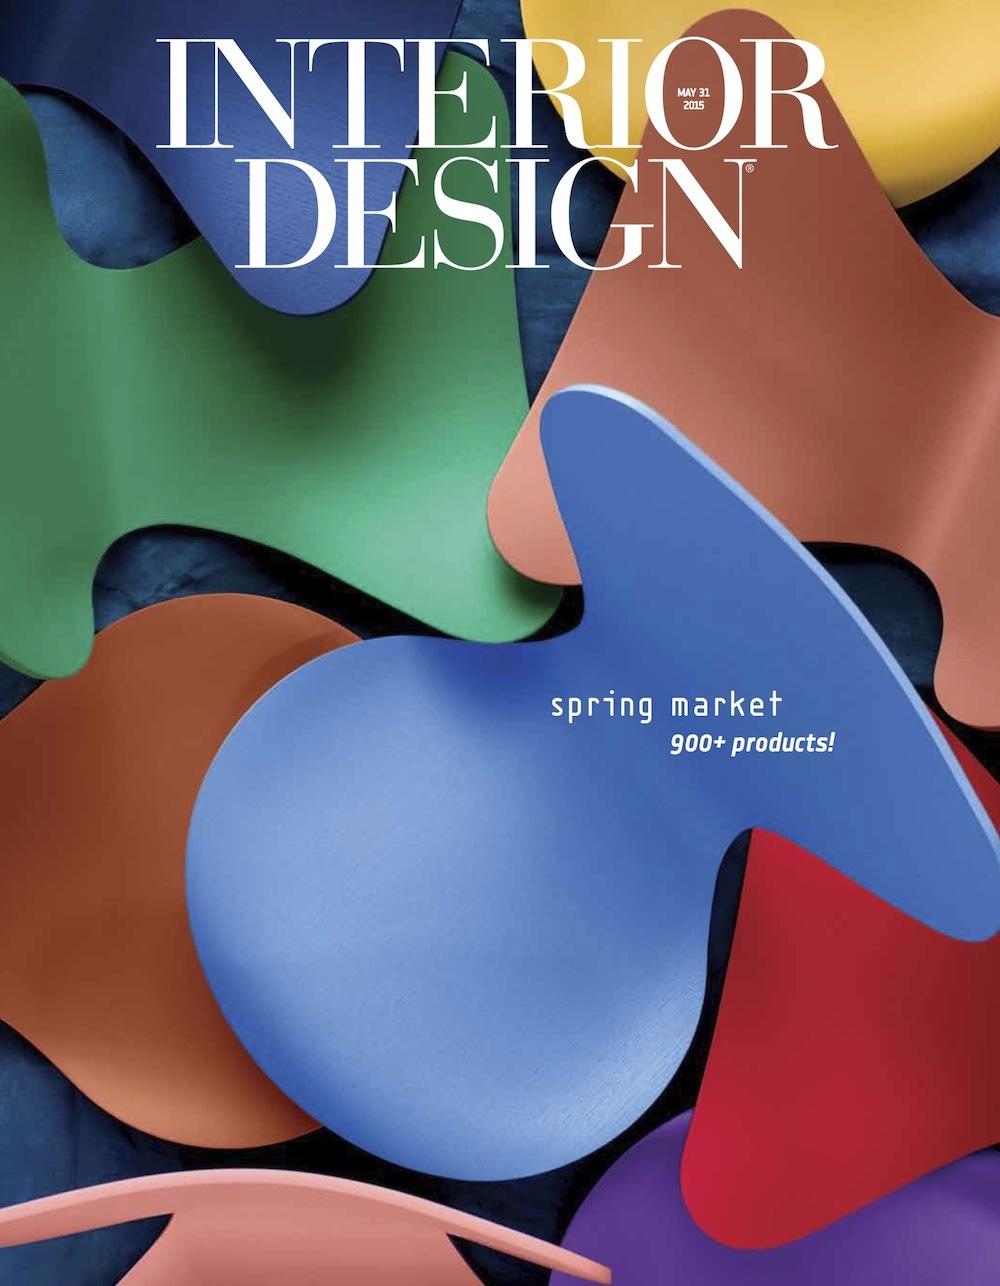 Interior-Design-June-2015-Cover.jpg